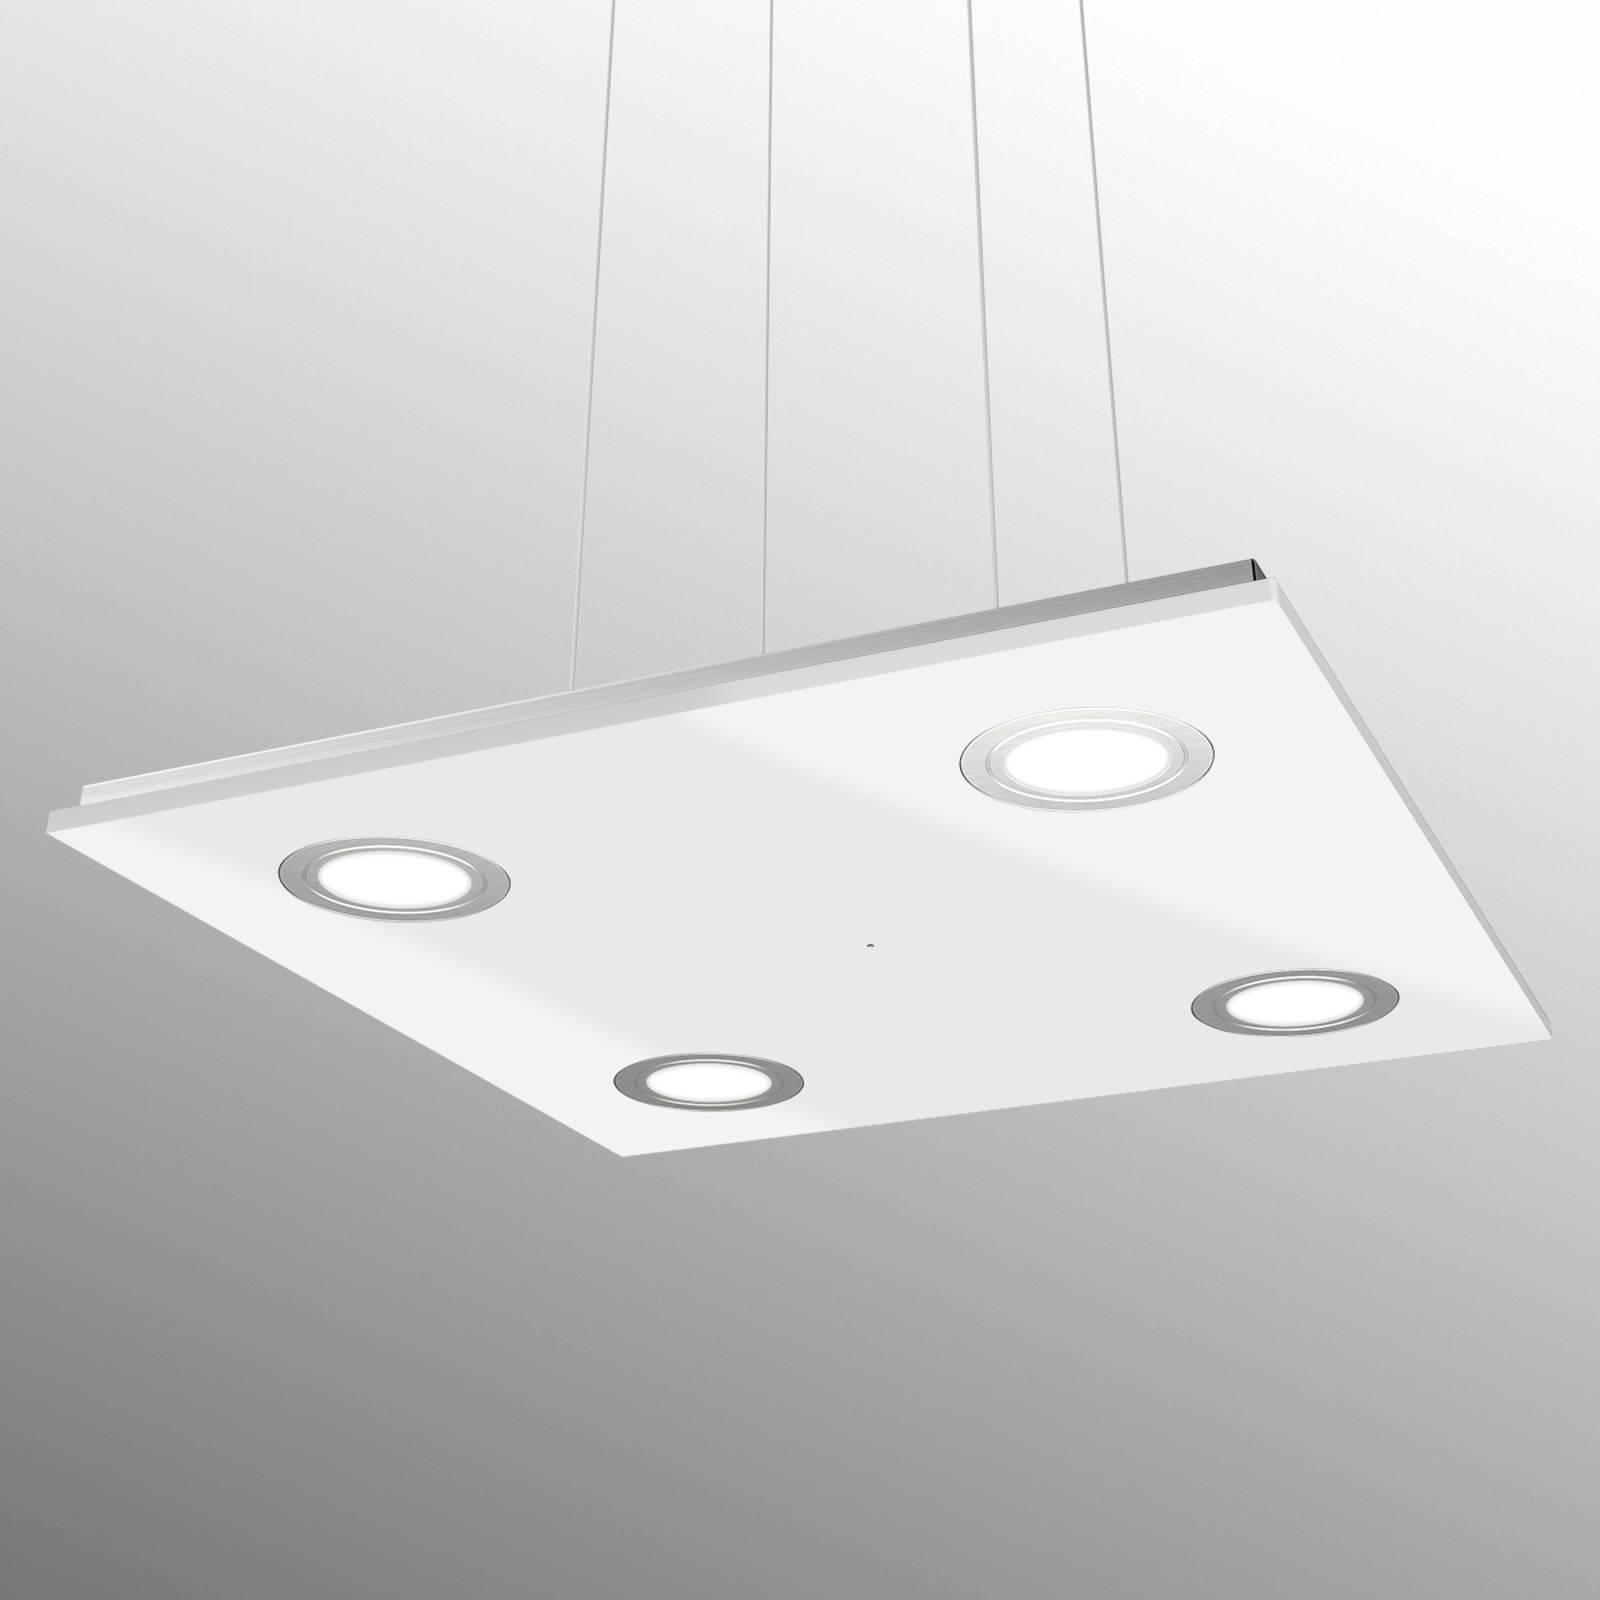 Suspension LED carrée Pano, blanche